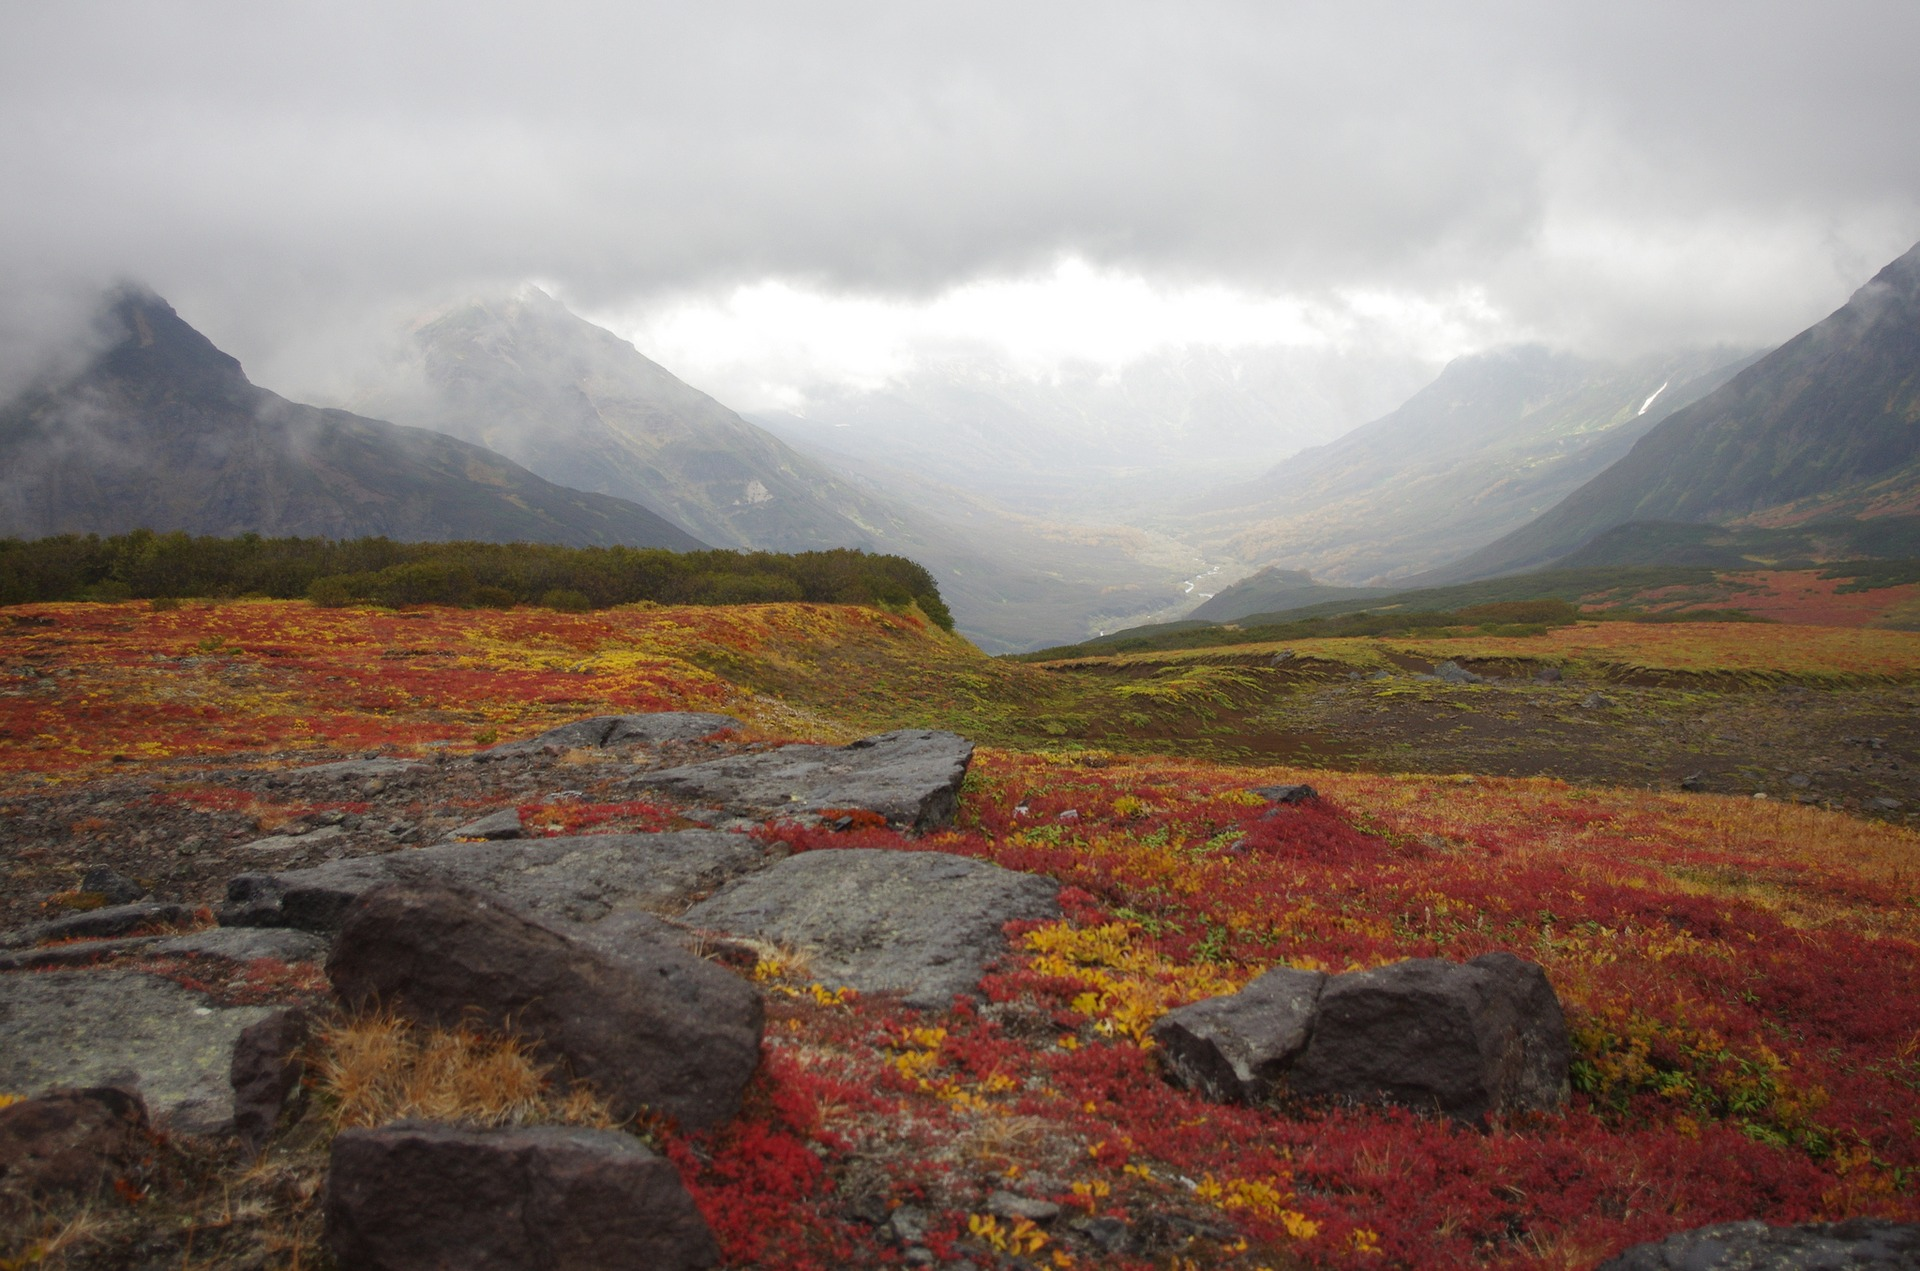 mountain-tundra-2761663_1920